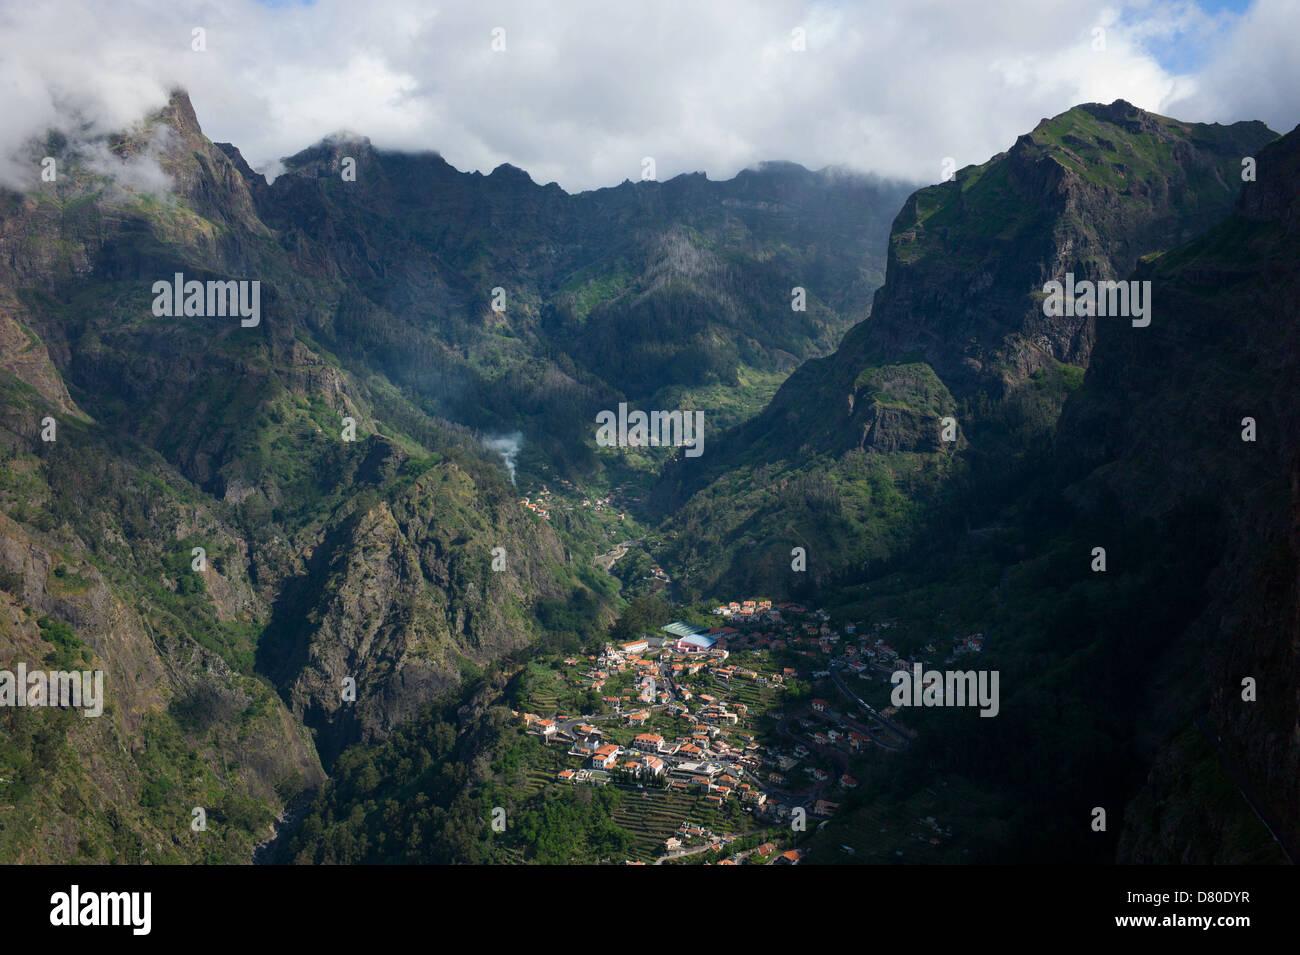 The town of Curral Das Freiras in Madeira - Stock Image